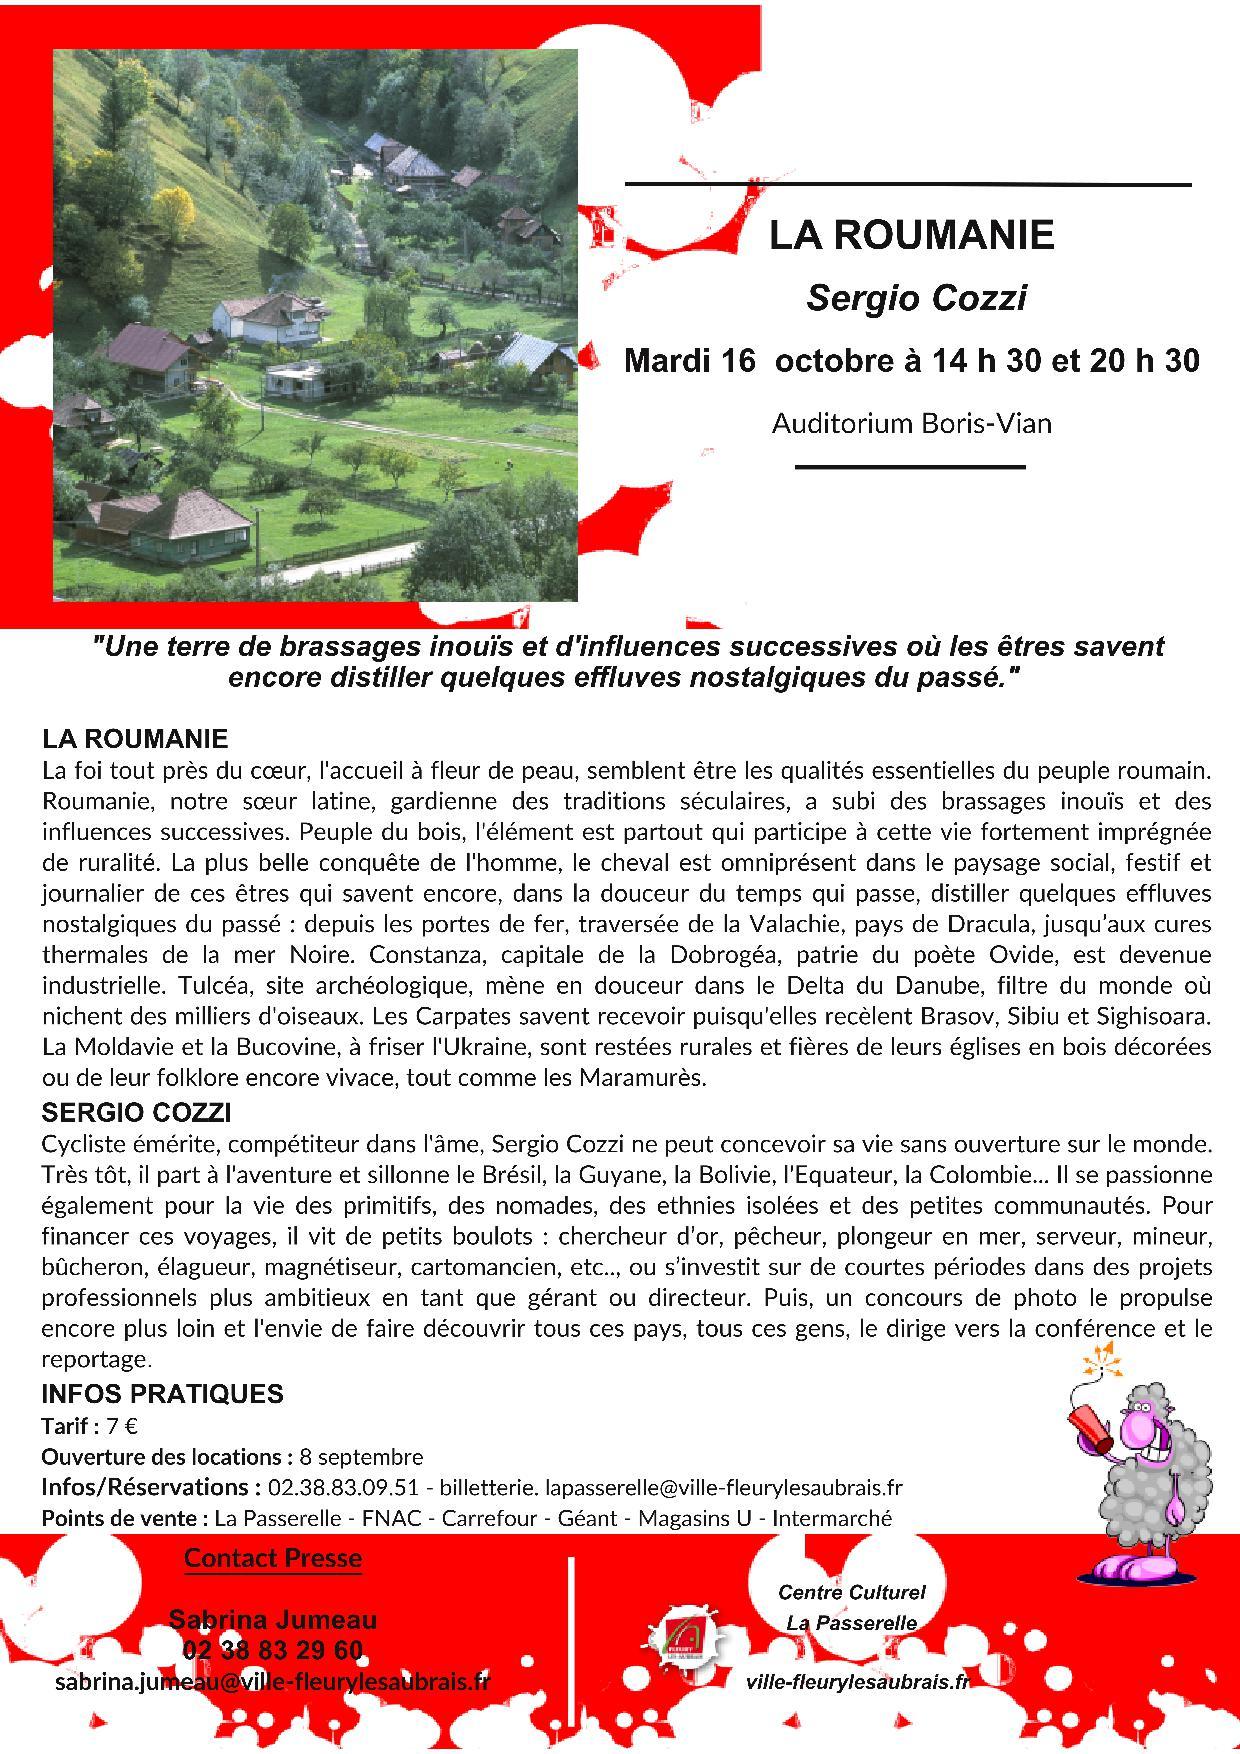 C_Users_Jose_AppData_Local_Temp_La Roumanie - 16 octobre.jpg